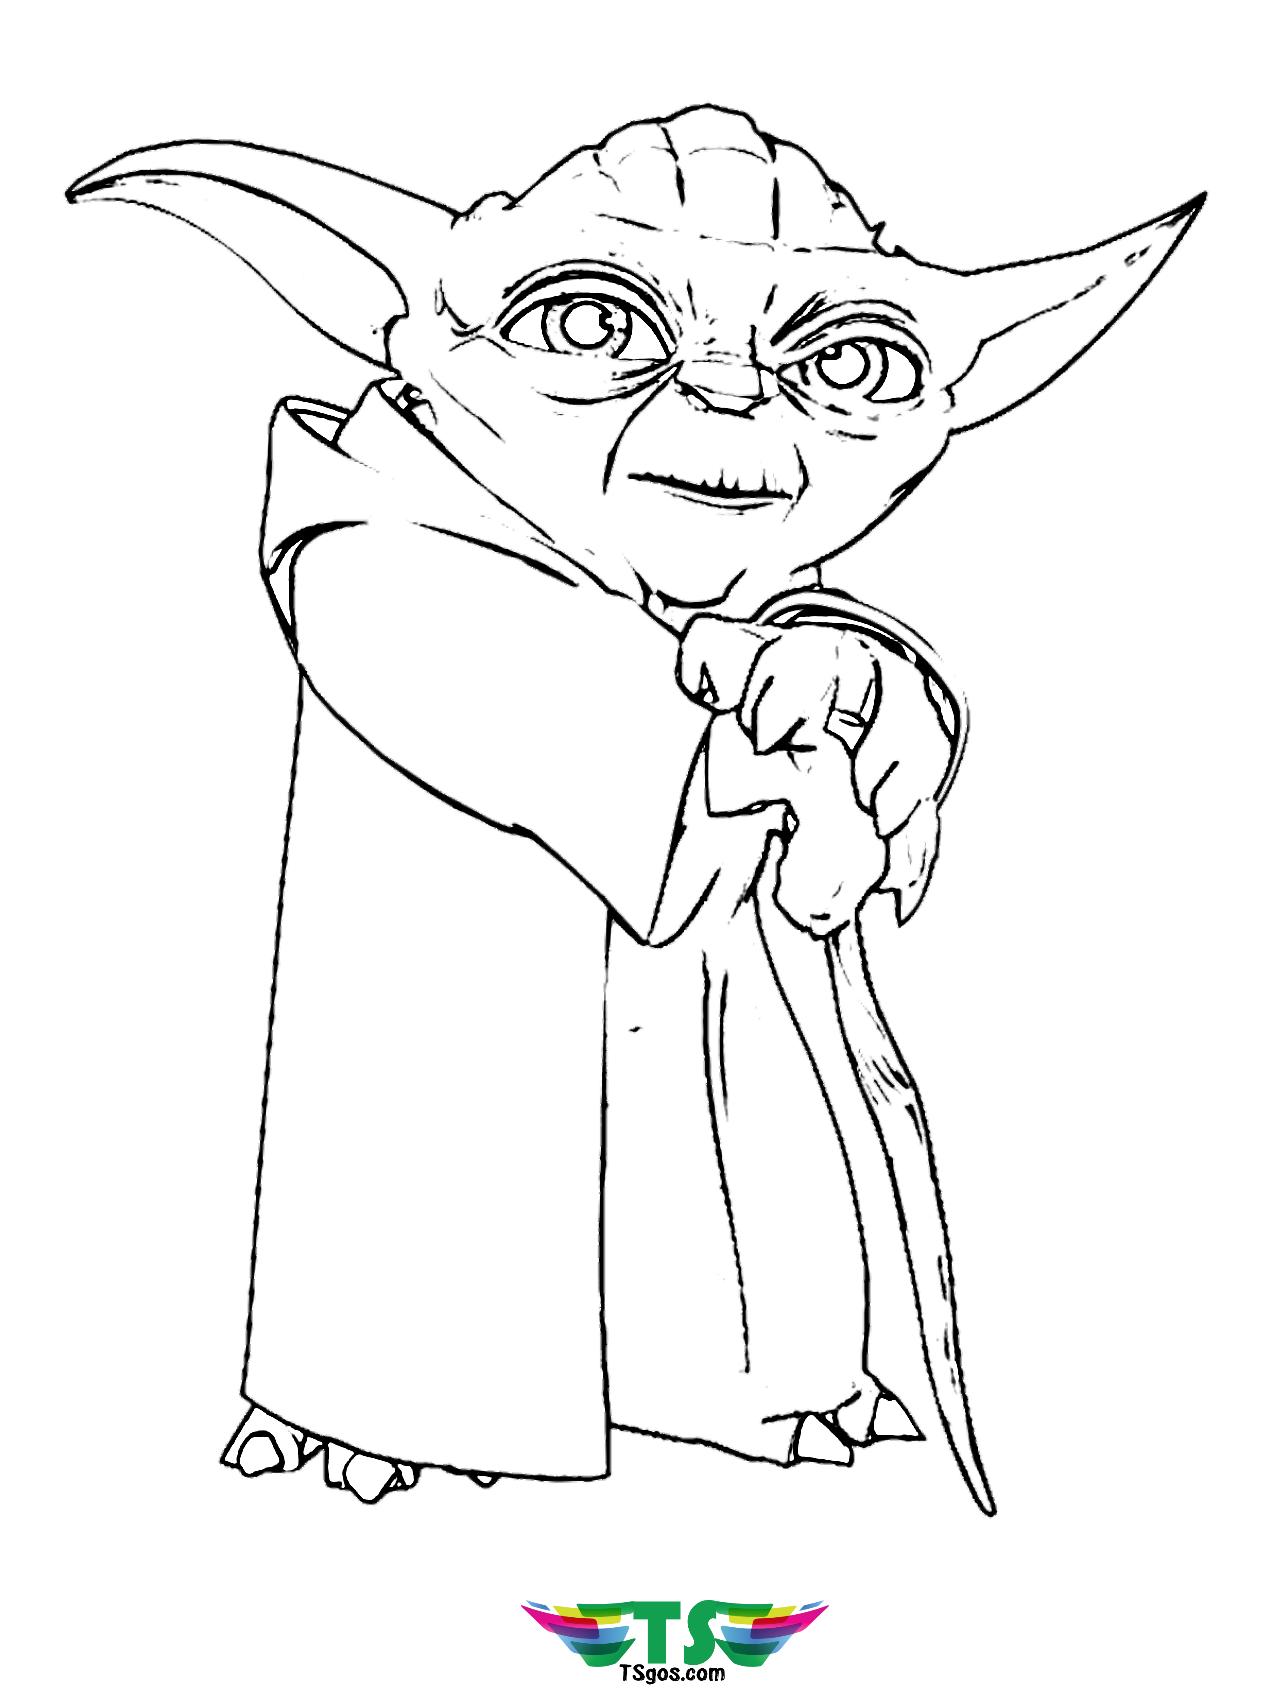 Star Wars Baby Yoda Coloring Pages Printable   Coloring and Drawing